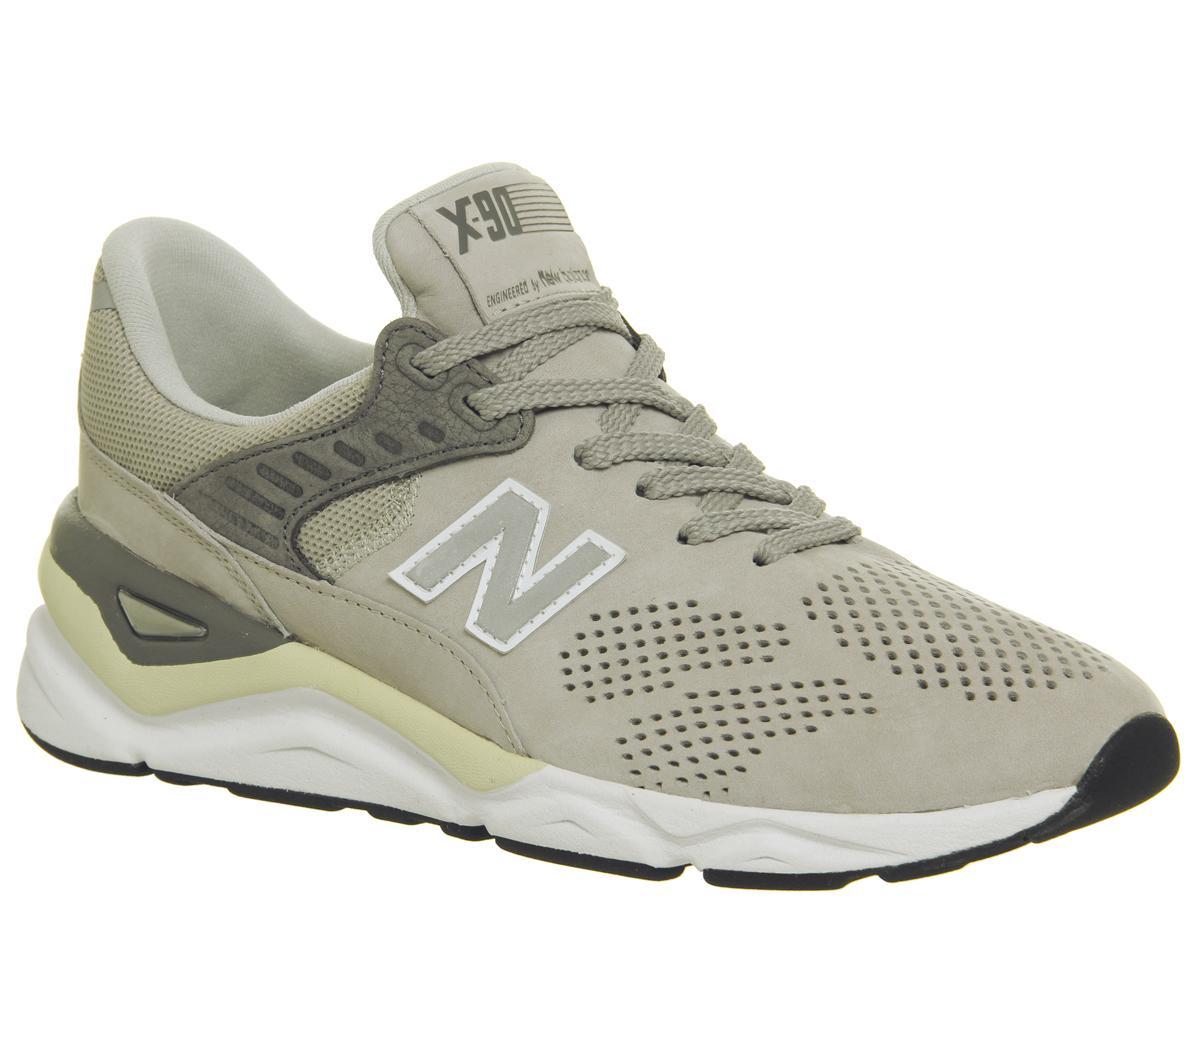 New Balance Msx90 Trainers Beige Grey